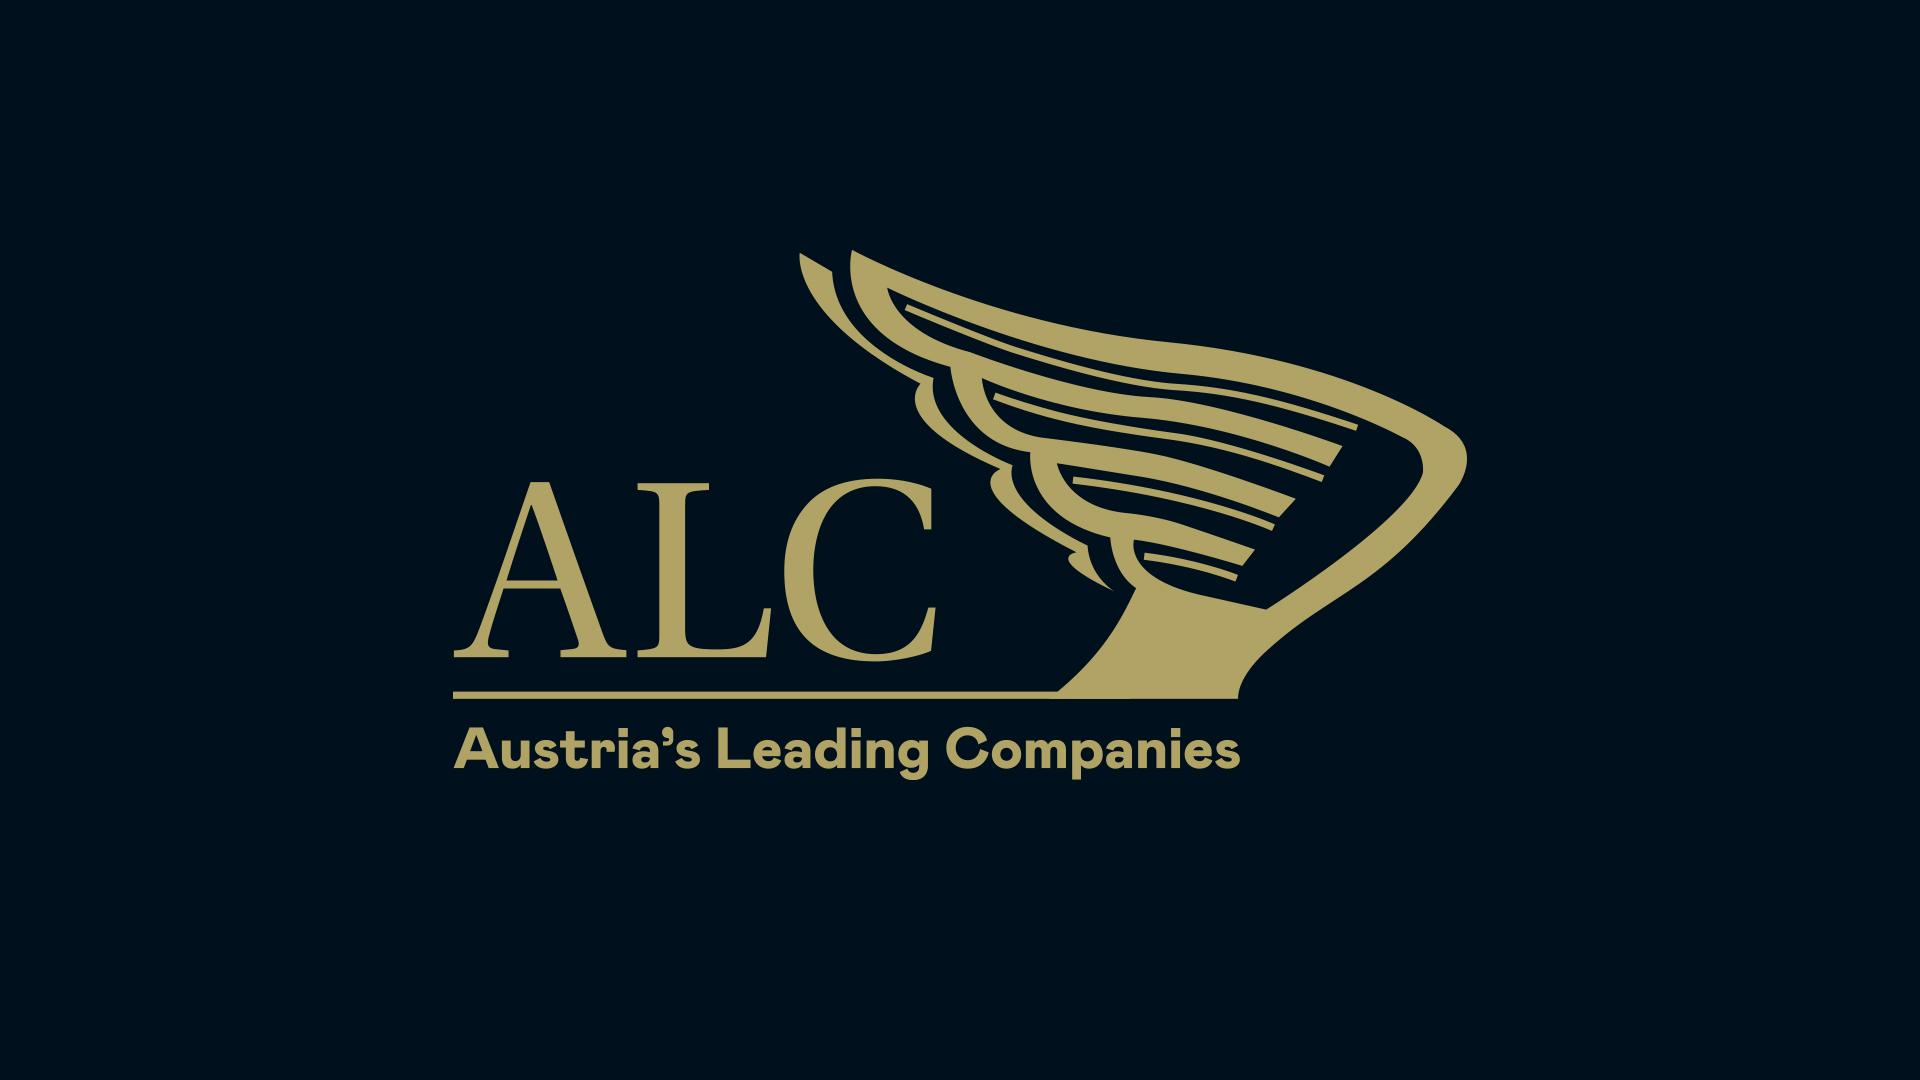 Austria's Leading Companies Logo